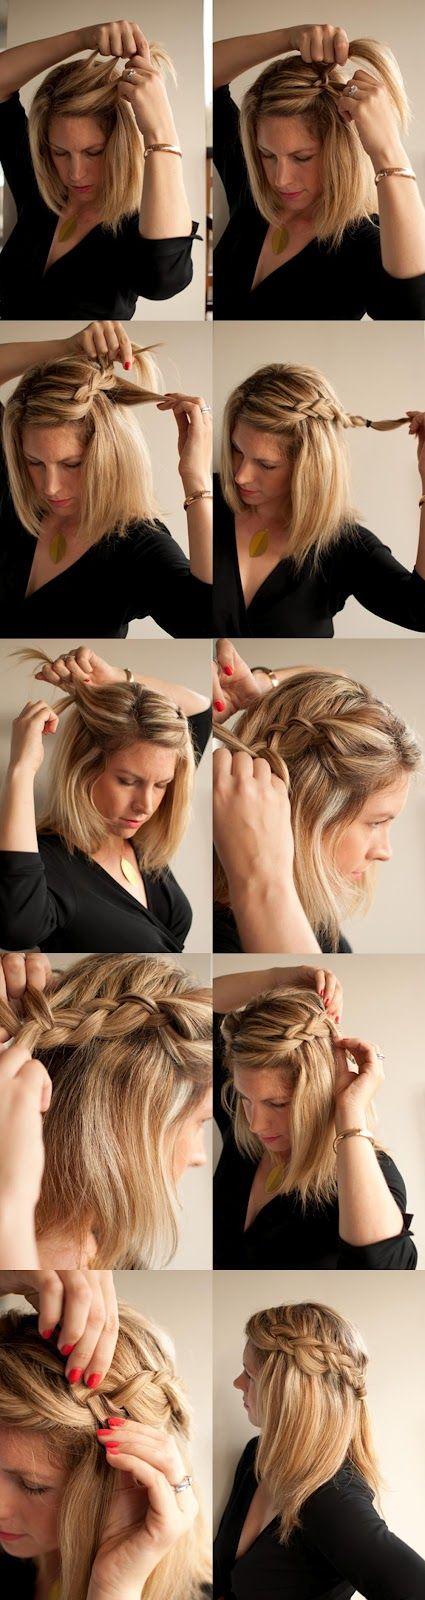 Make Easy and simple side braid   hairstyles tutorial